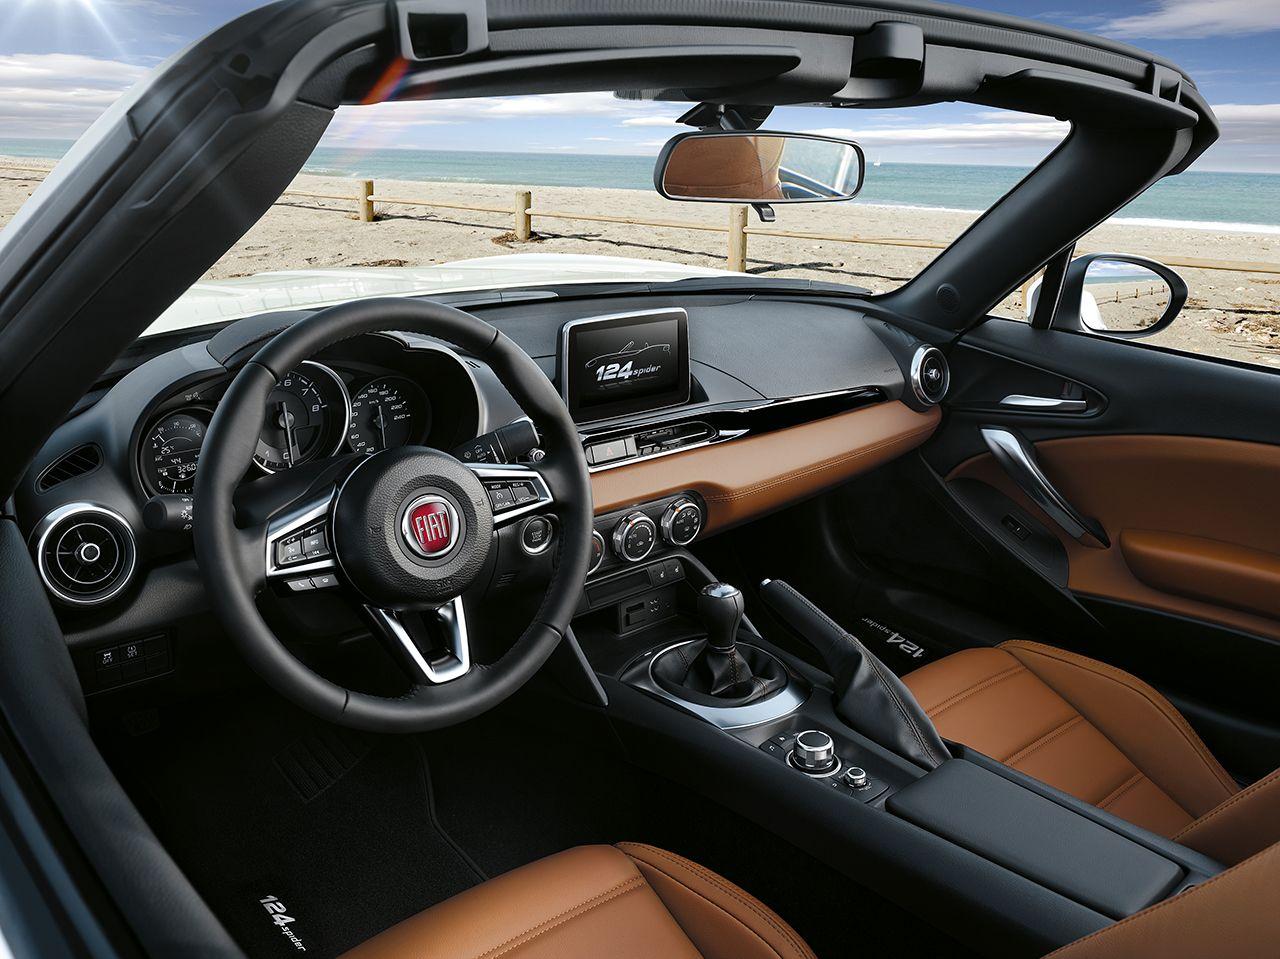 160301 Fiat 124 Spider 11 Άνοιξαν οι παραγγελίες τoυ νέου FIAT 124 Spider στην ελληνική αγορά! cabrio, Fiat, fiat 124 spider, Roadster, αγορά